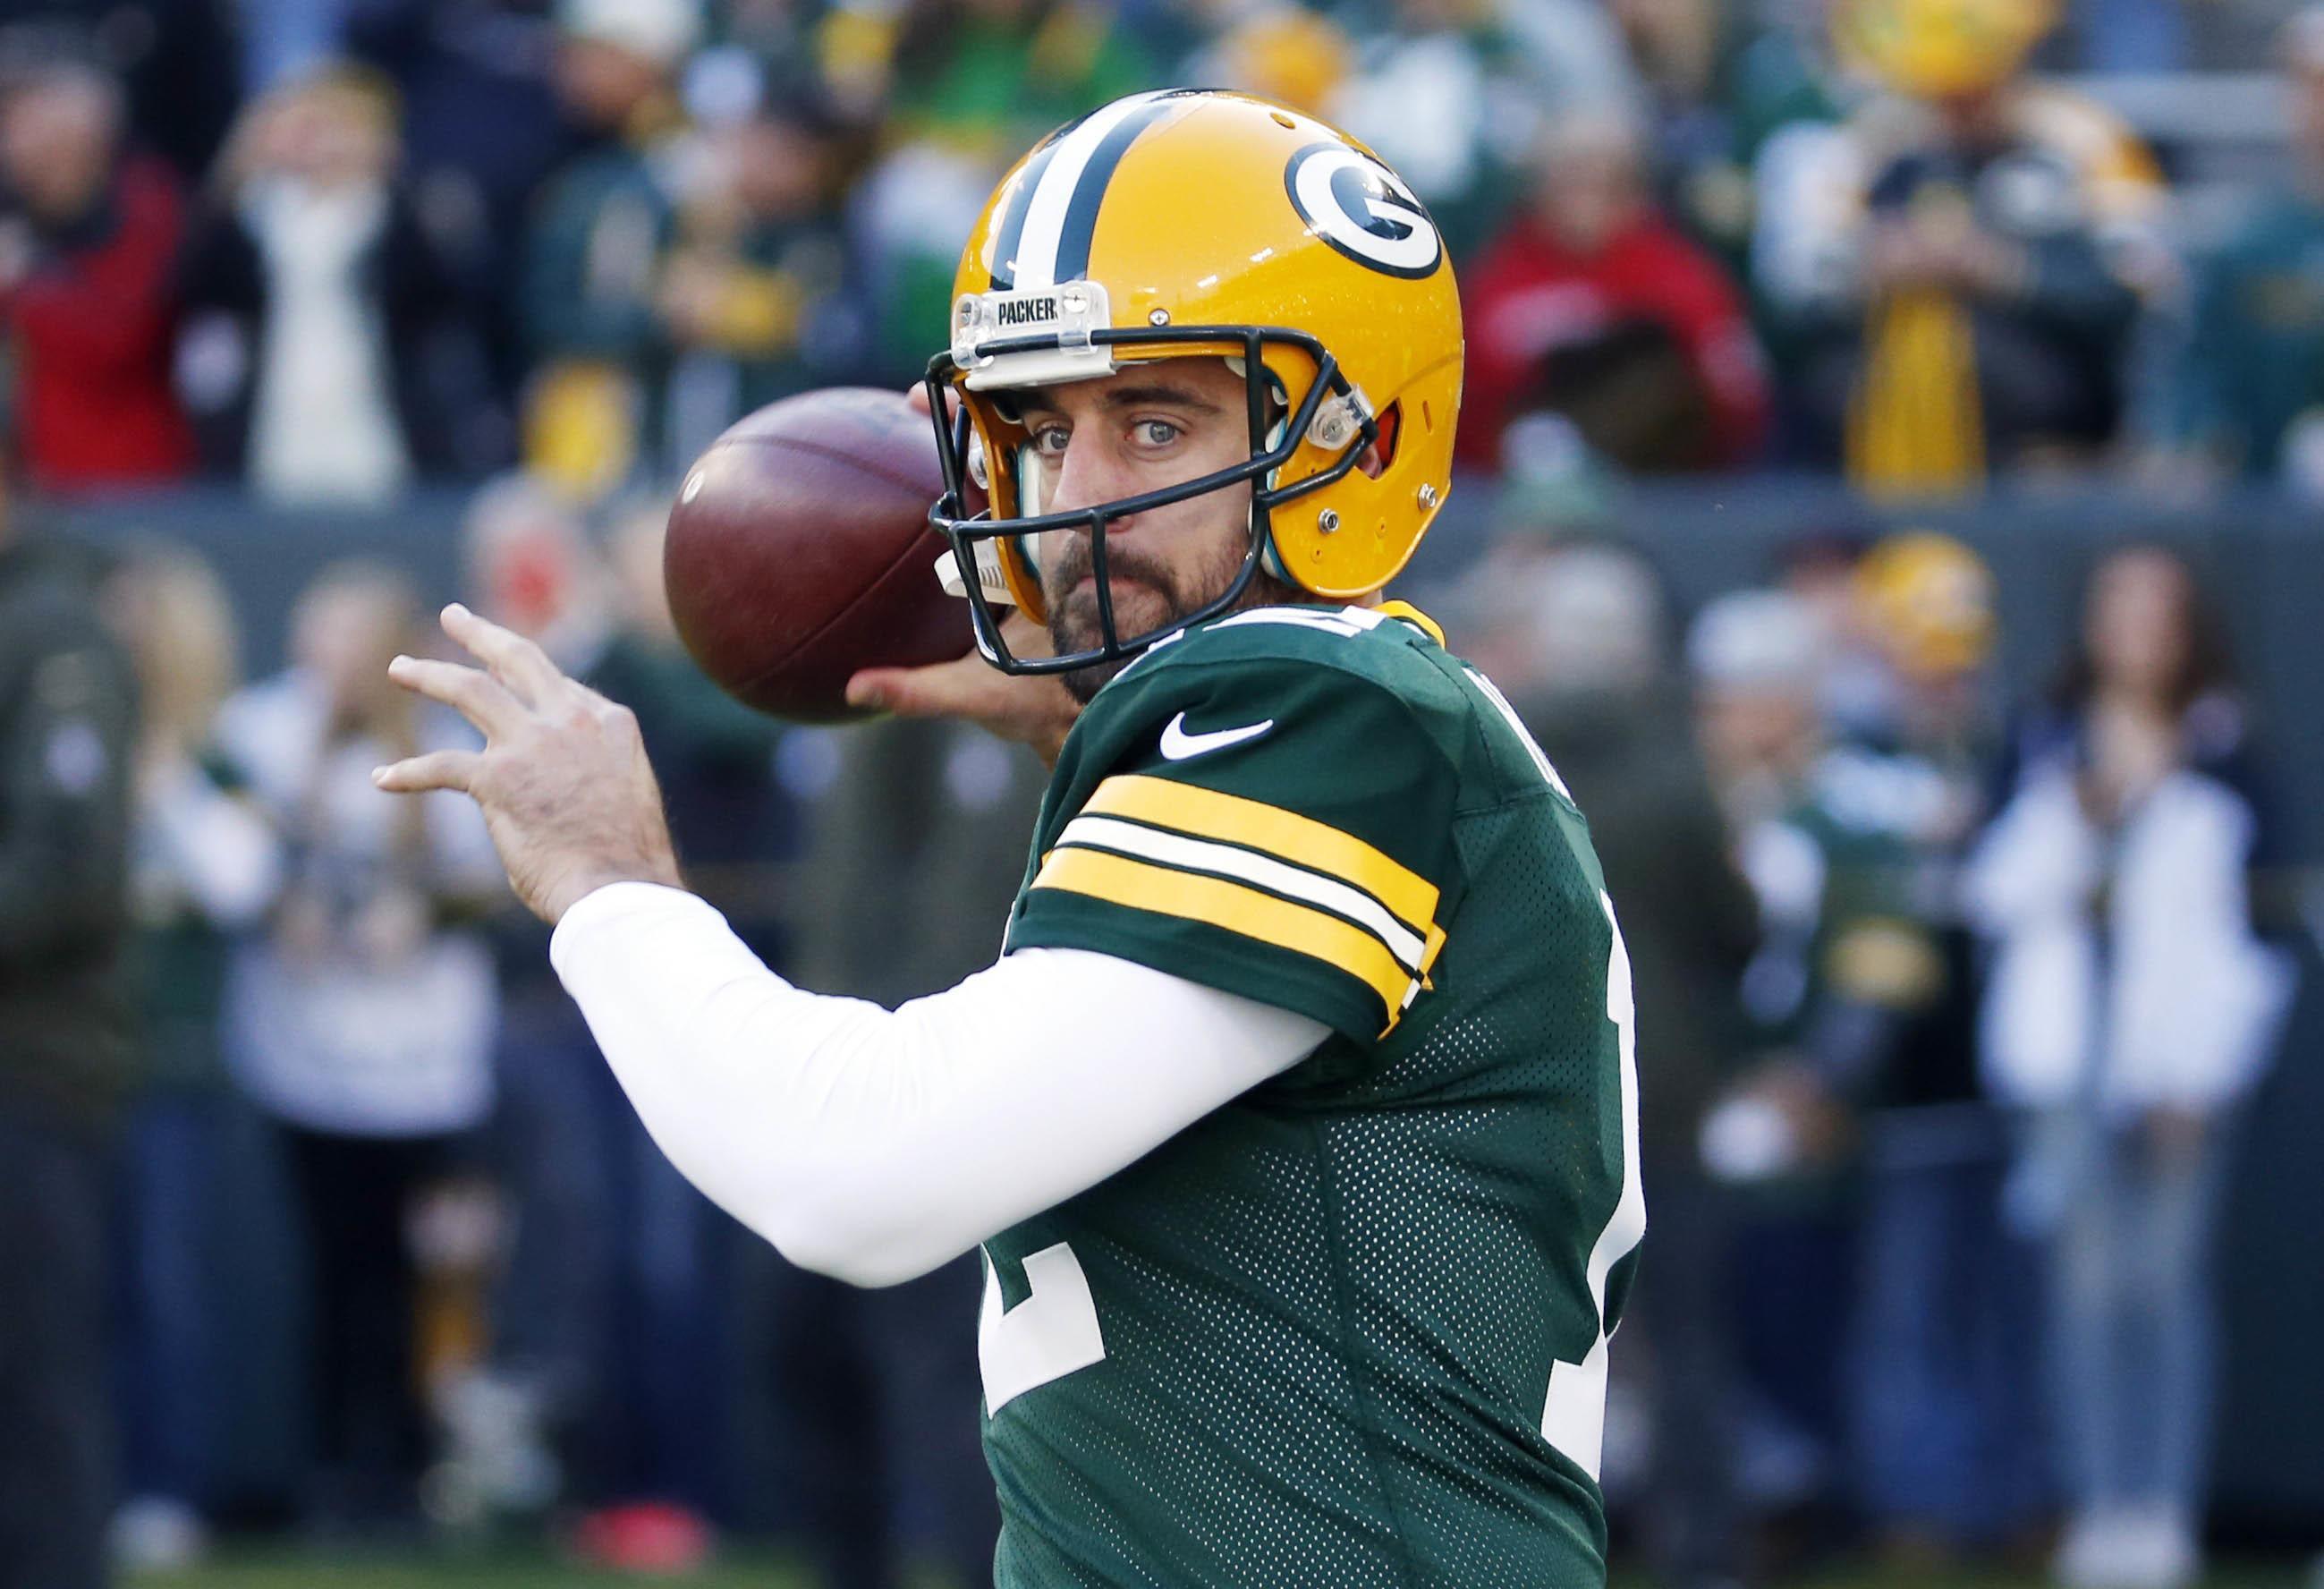 Packers_mccarthy_football